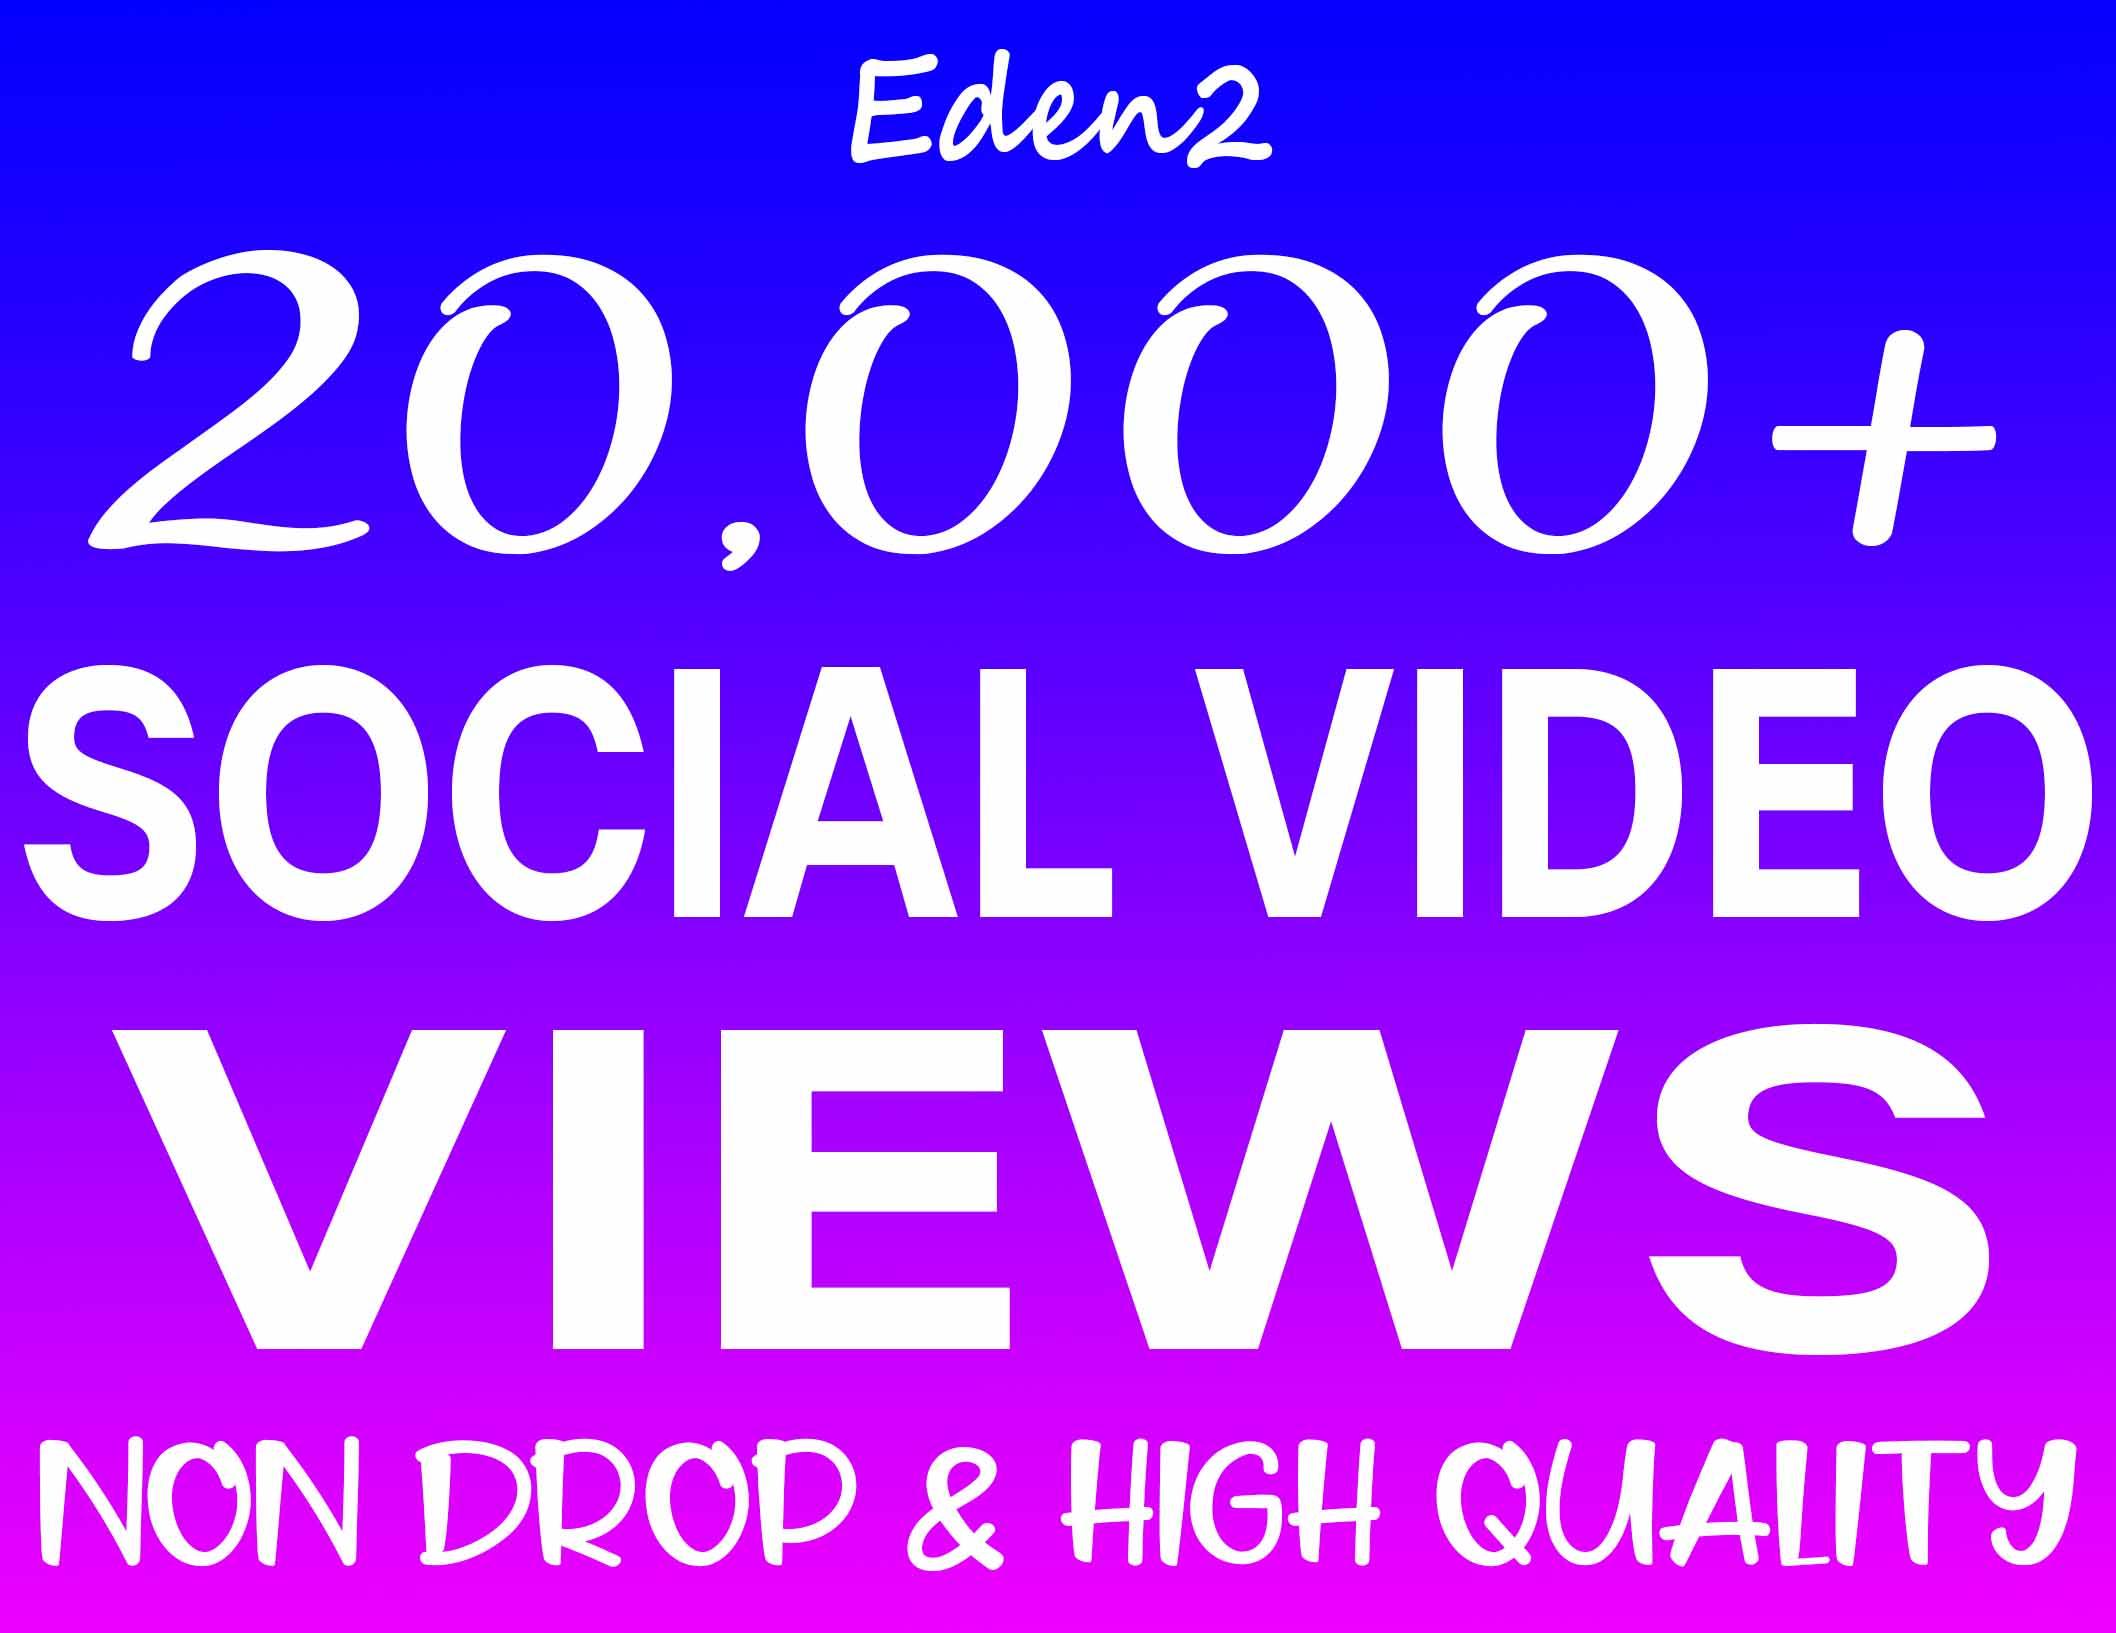 Add 20K Social Video Views Non Drop & High Quality - INSTANT START